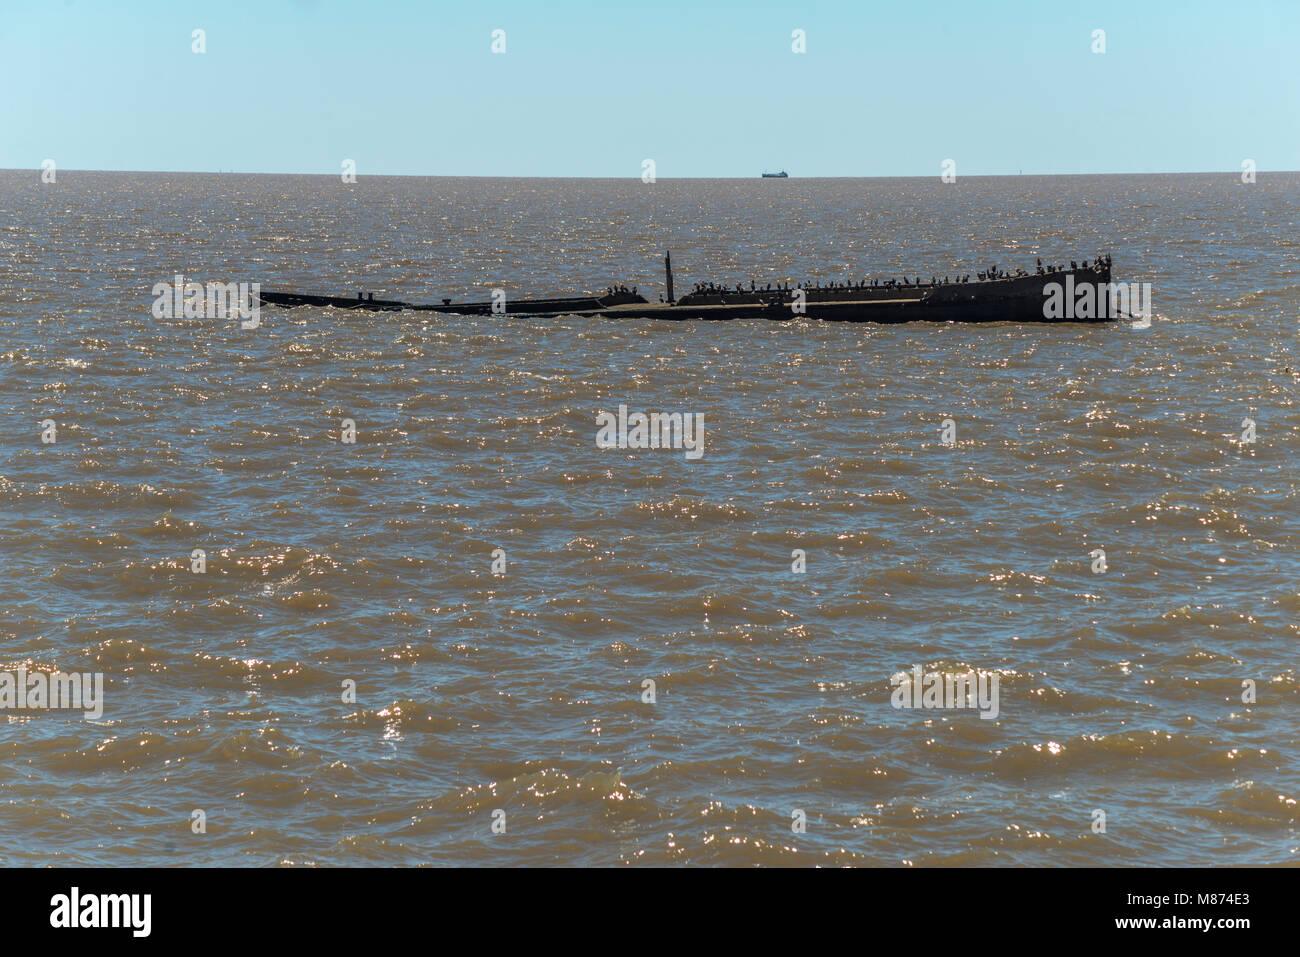 shipwreck in the Rio de la Plata, sunken ship with many birds on deck - Stock Image